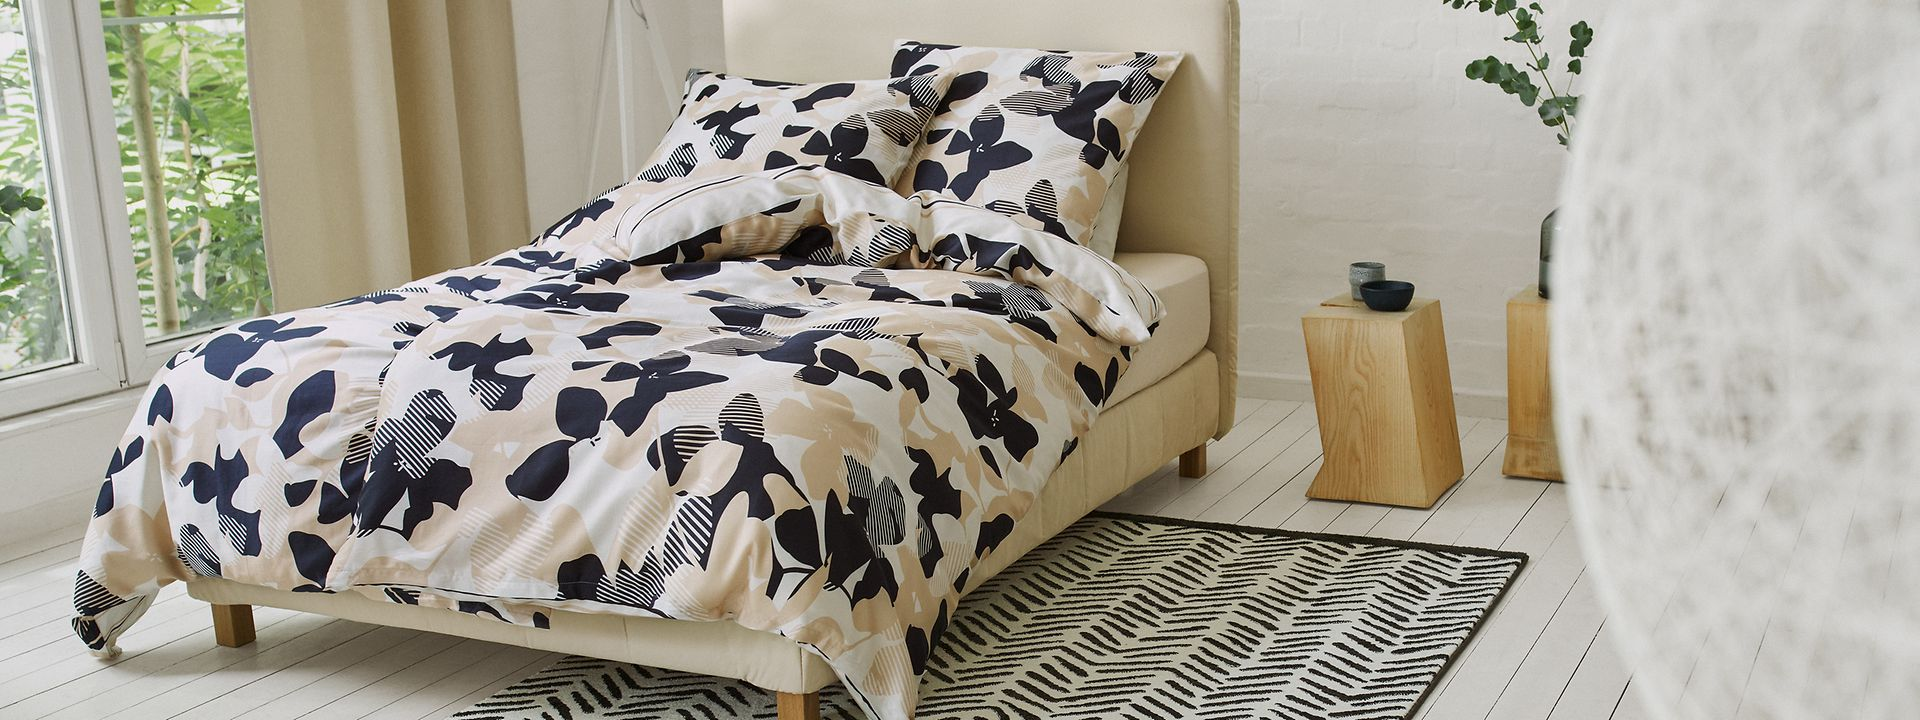 082021 - home - hero banner - bedroom - IMG